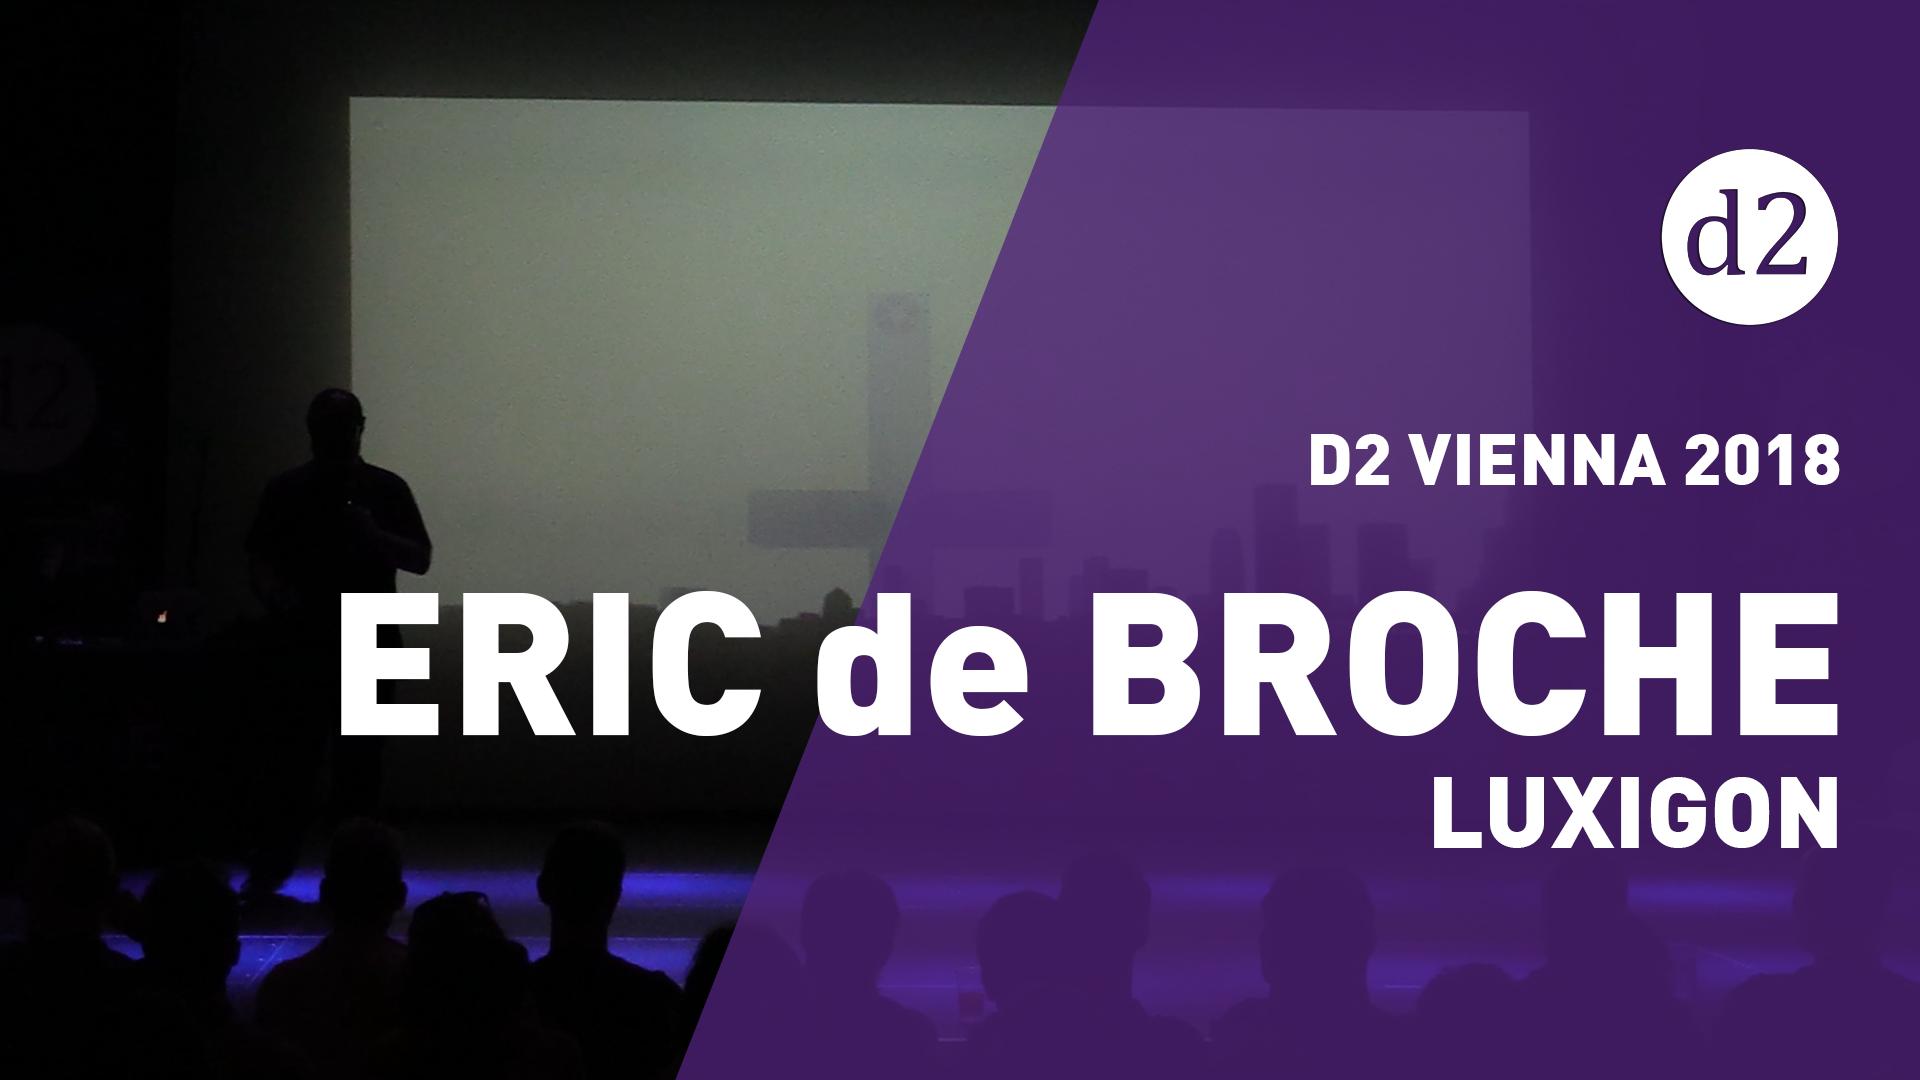 D2 Vienna 2018: Eric de Broche from Luxigon